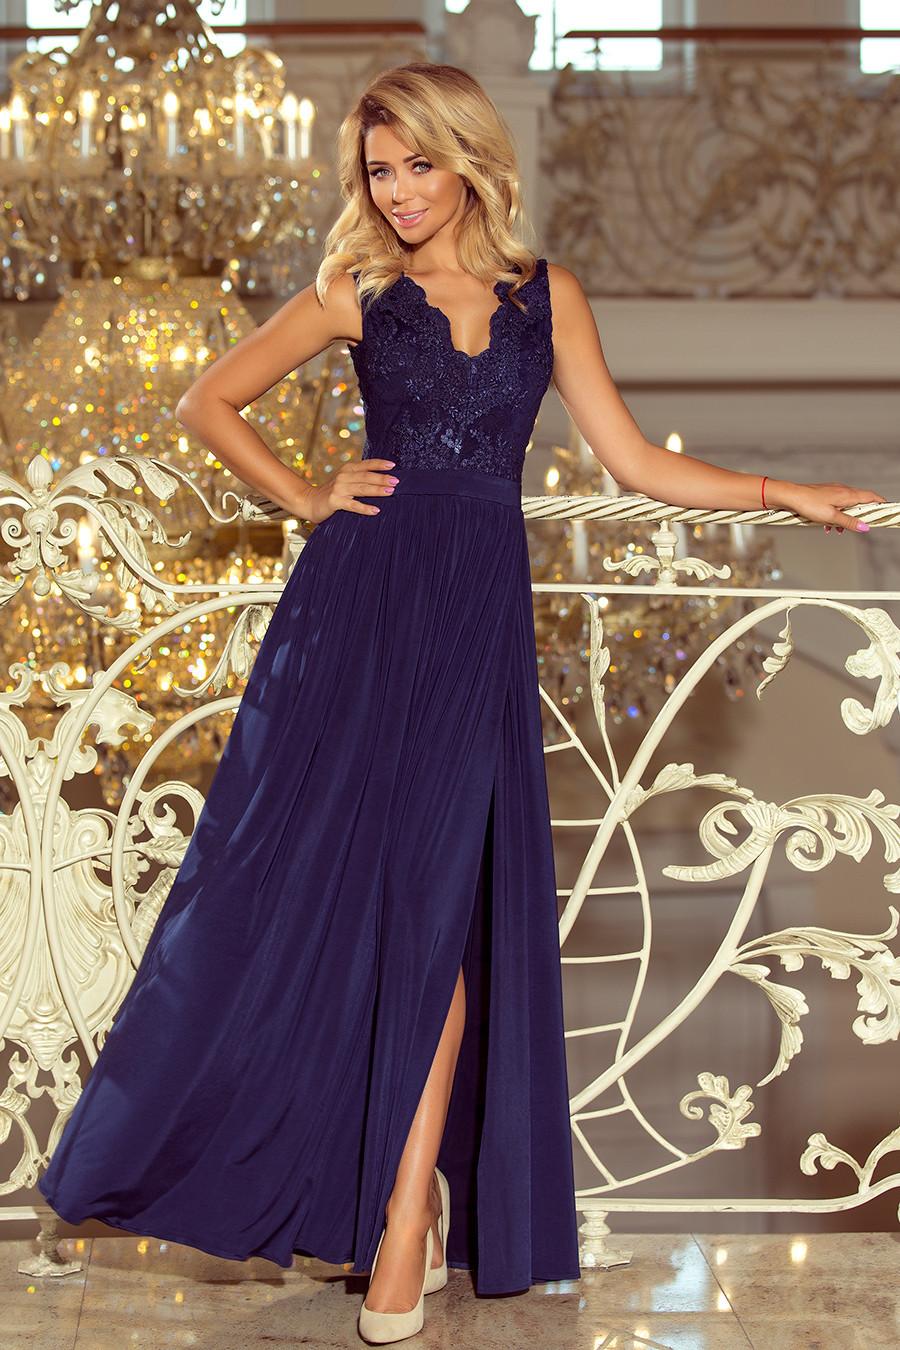 LEA - Dlhé tmavo modré dámske šaty bez rukávov s vyšívaným výstrihom 215-2 S